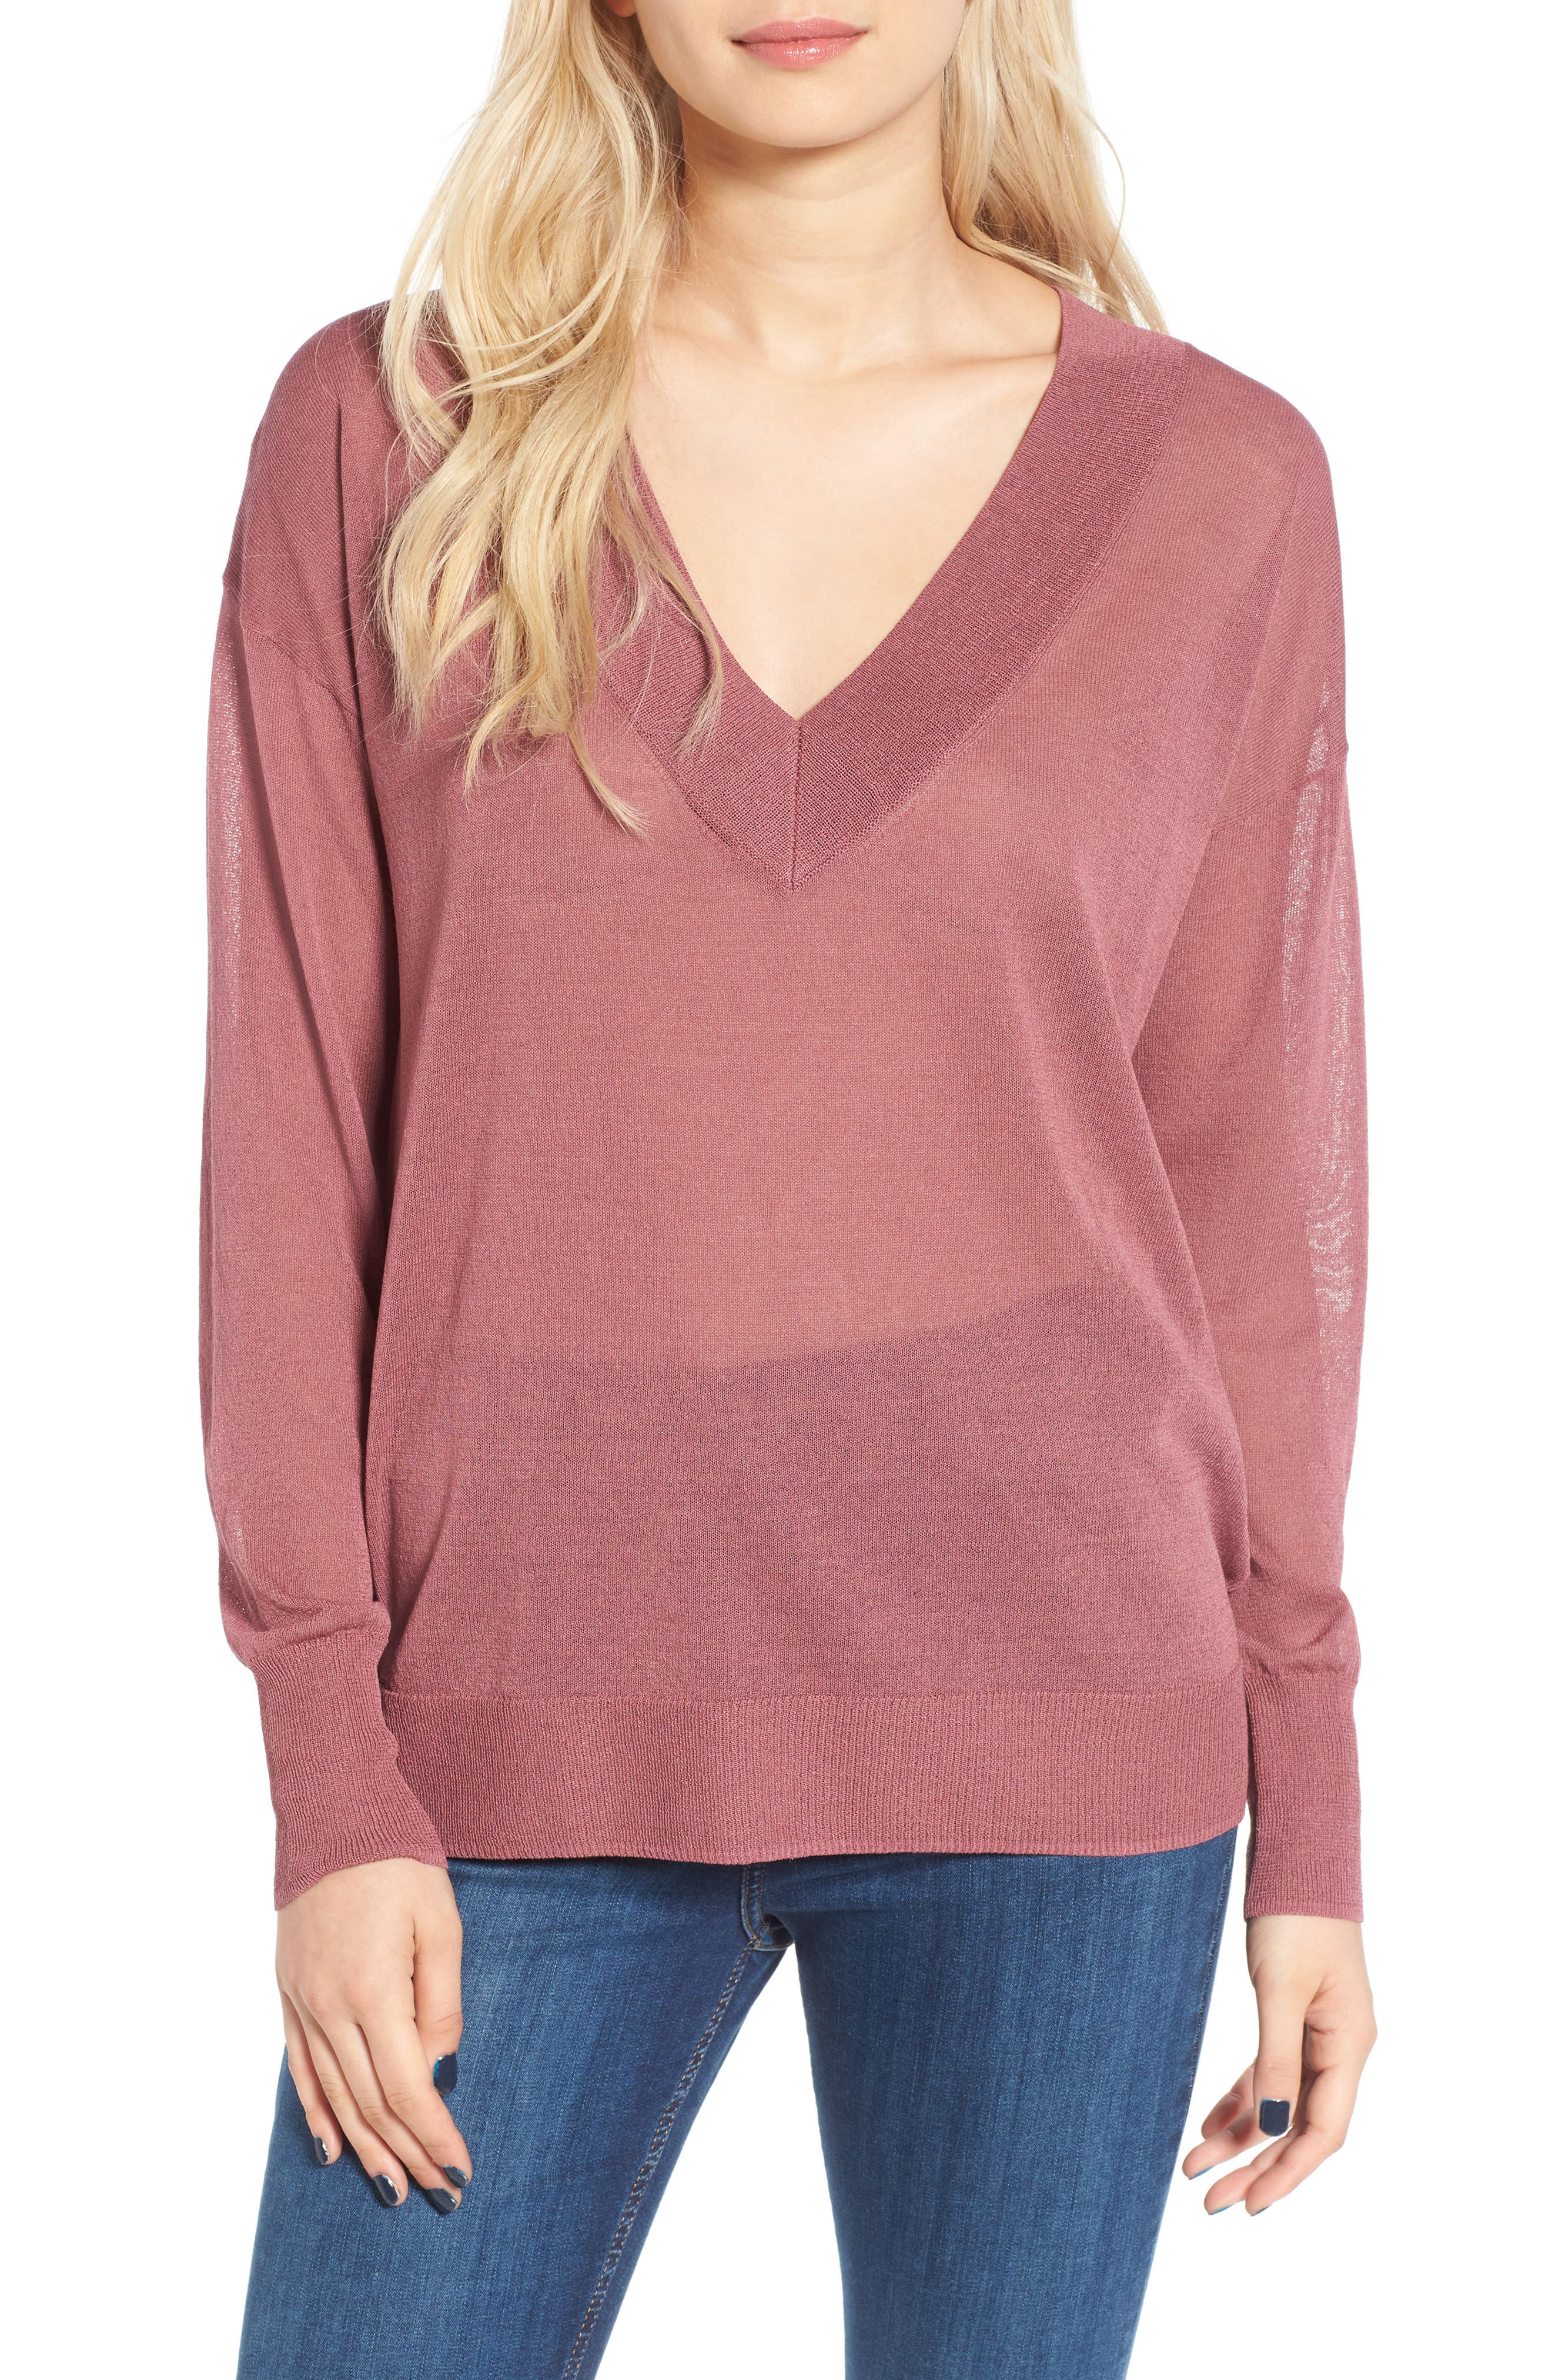 Alternate Image 1 Selected - Leith Sheer V-Neck Sweater